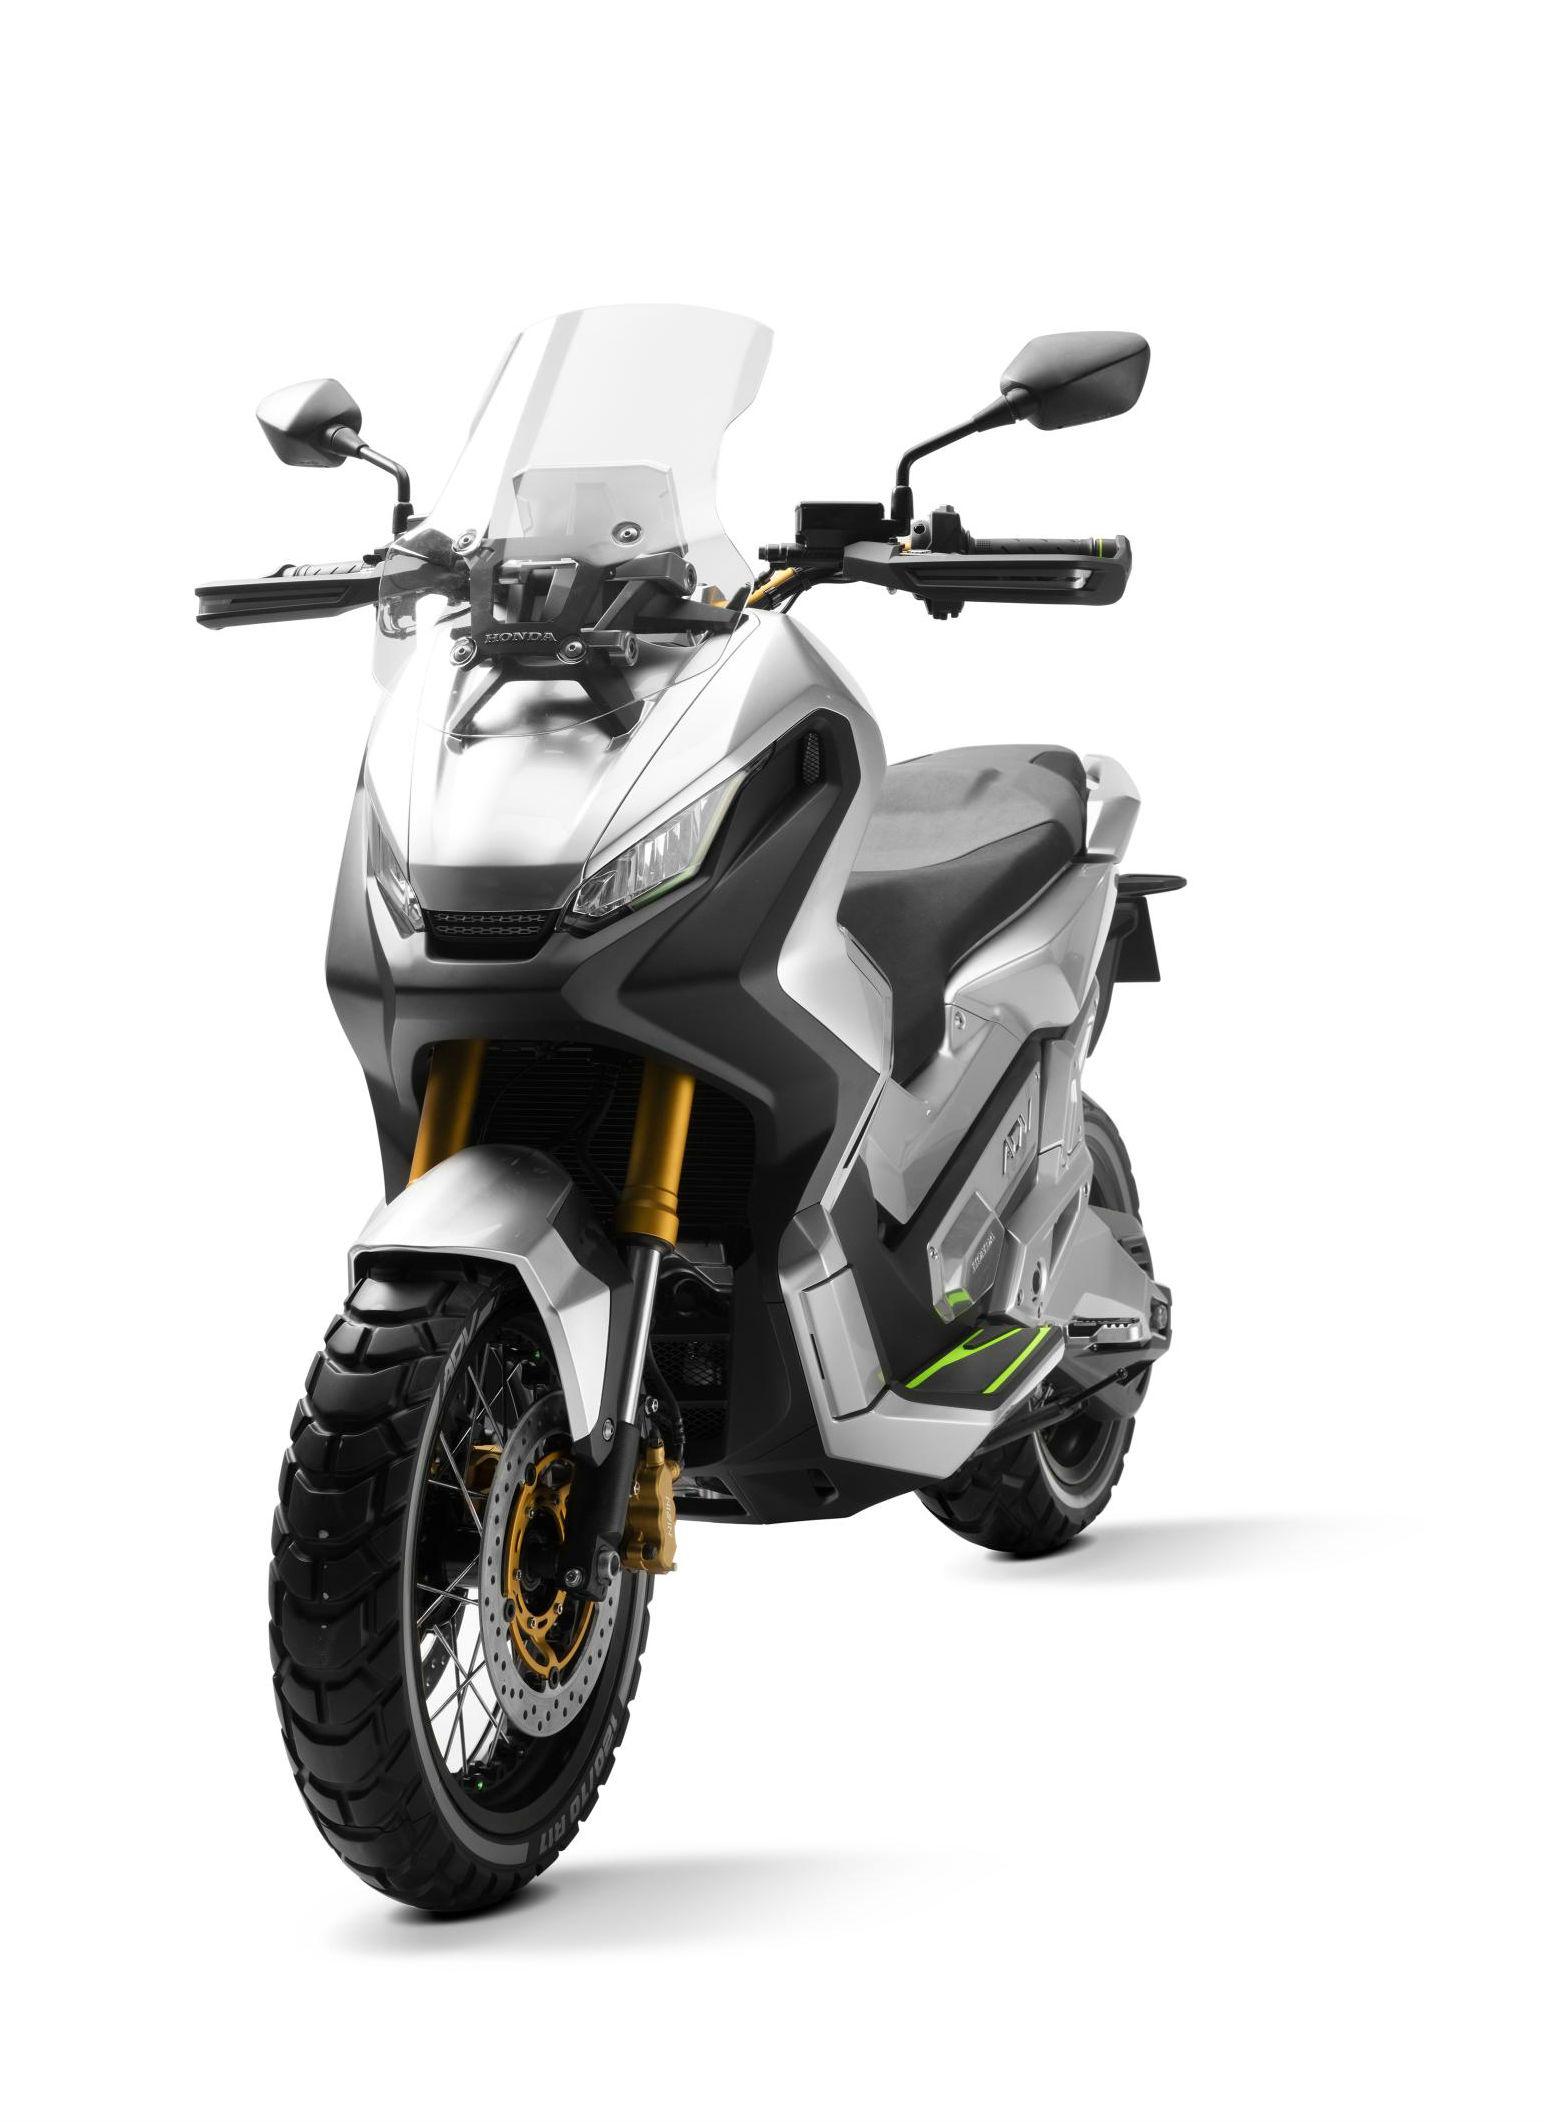 Honda City Adventure to be called 'ADV'